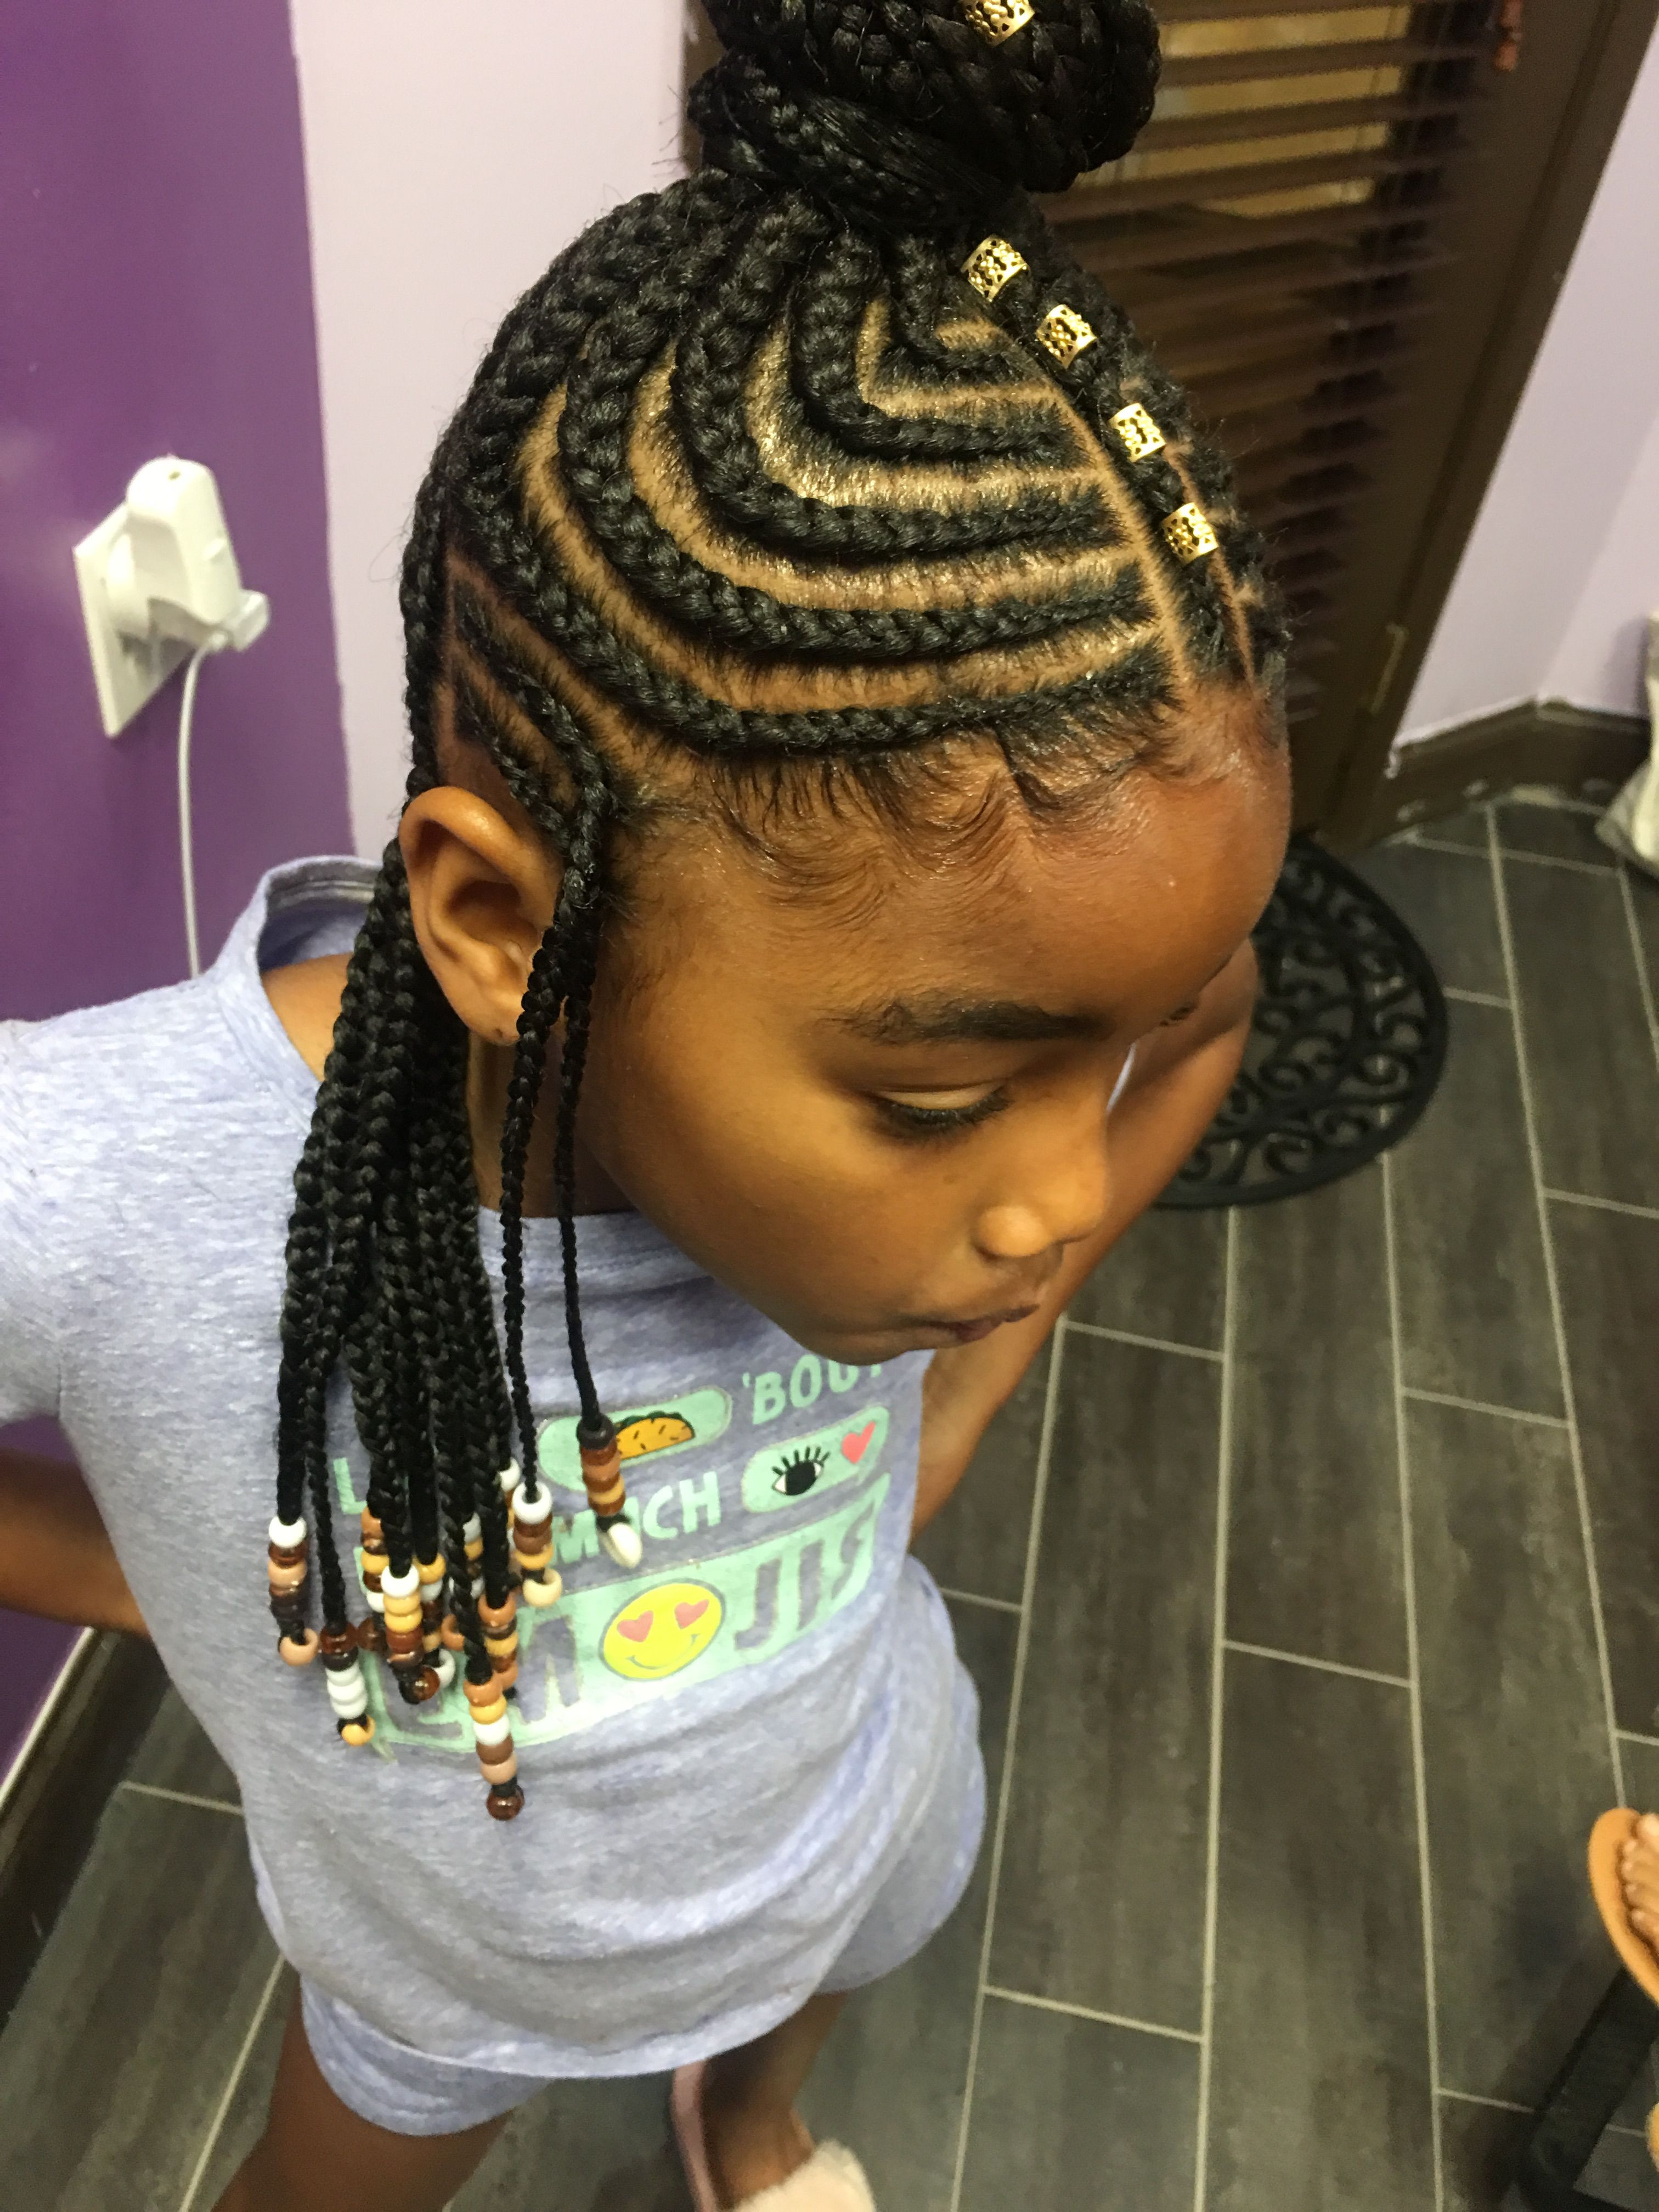 Best ideas about Hairstyles Kids . Save or Pin Kids Tribal Braids by shugabraids Twist Now.